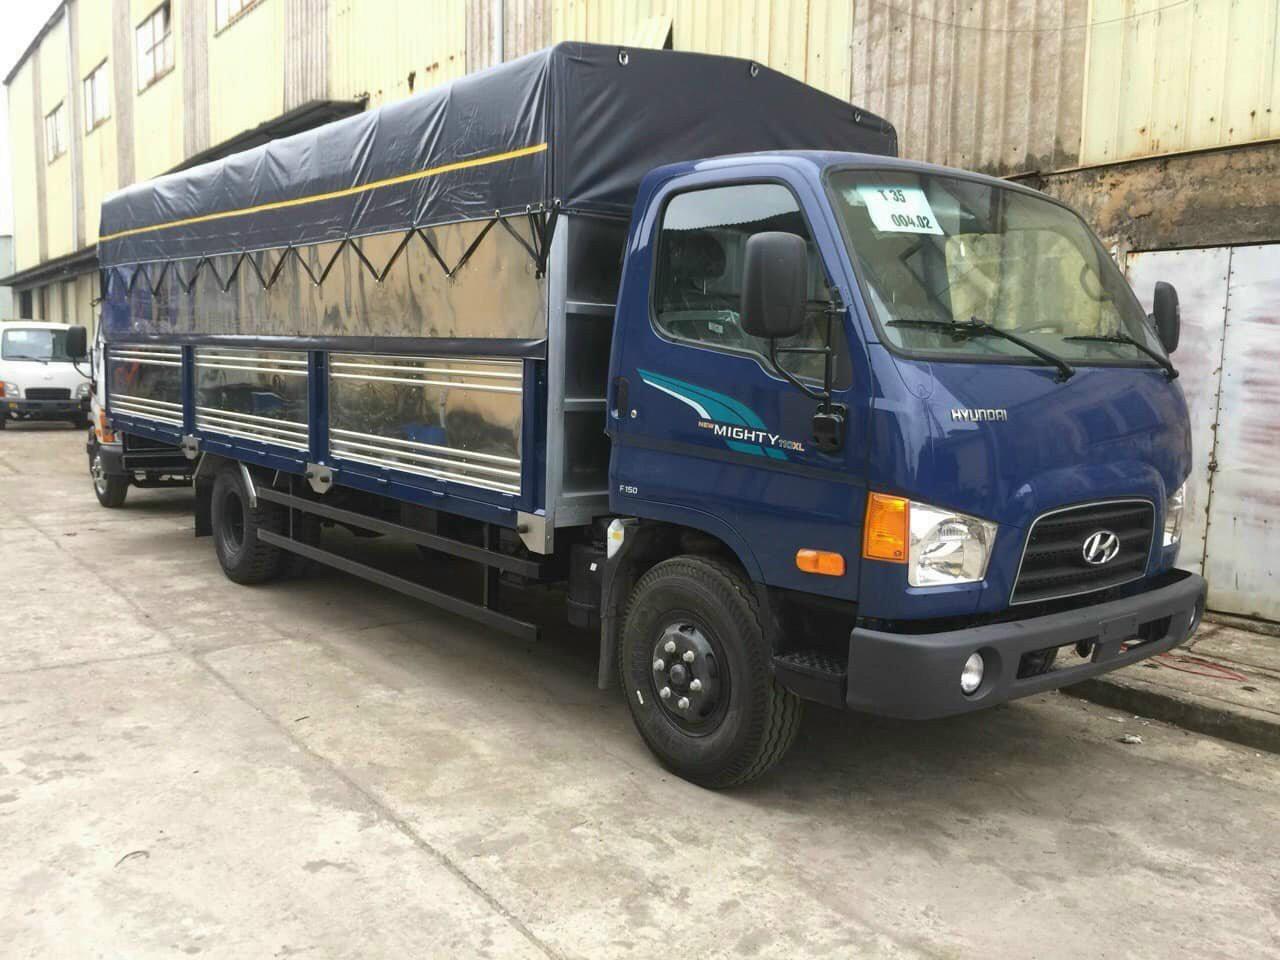 Bán xe tải Hyundai 110xl tại Cao Bằng